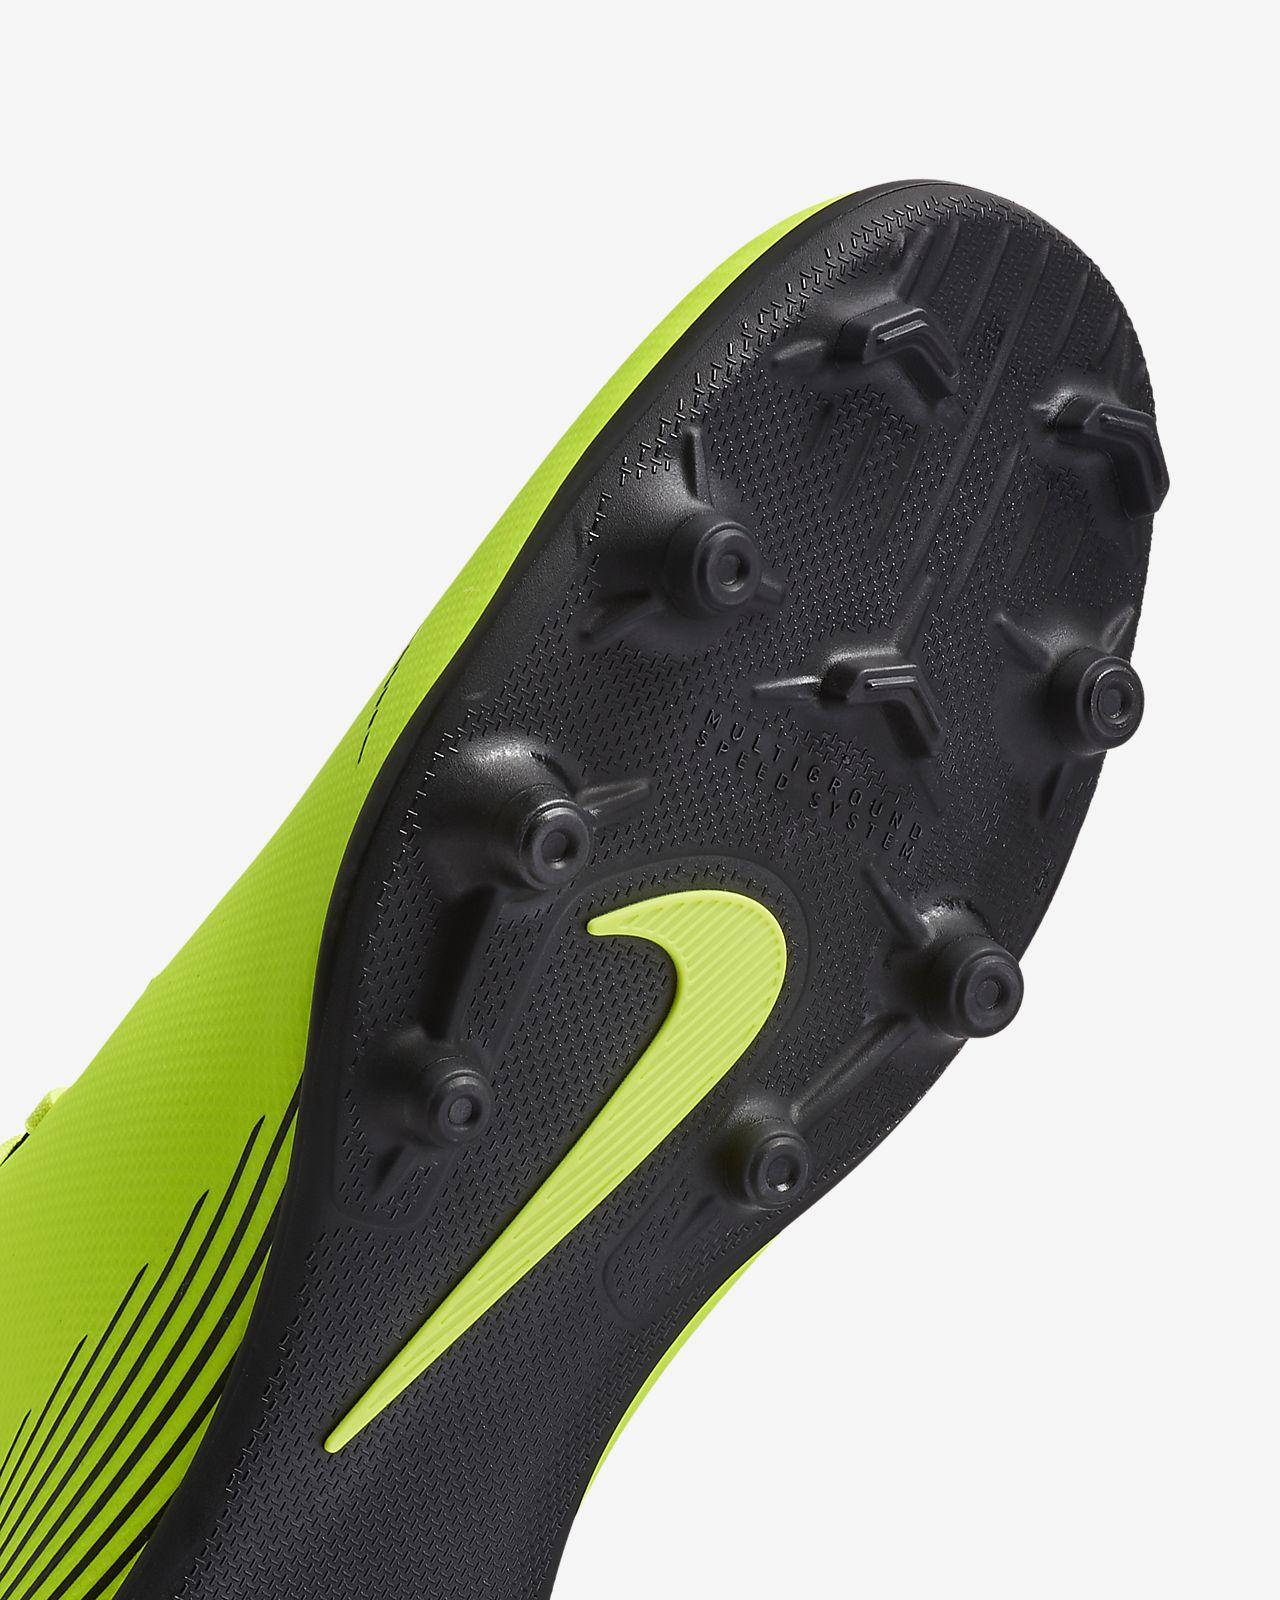 b08600d33271 Nike Mercurial Vapor XII Club Multi-Ground Soccer Cleat. Nike.com